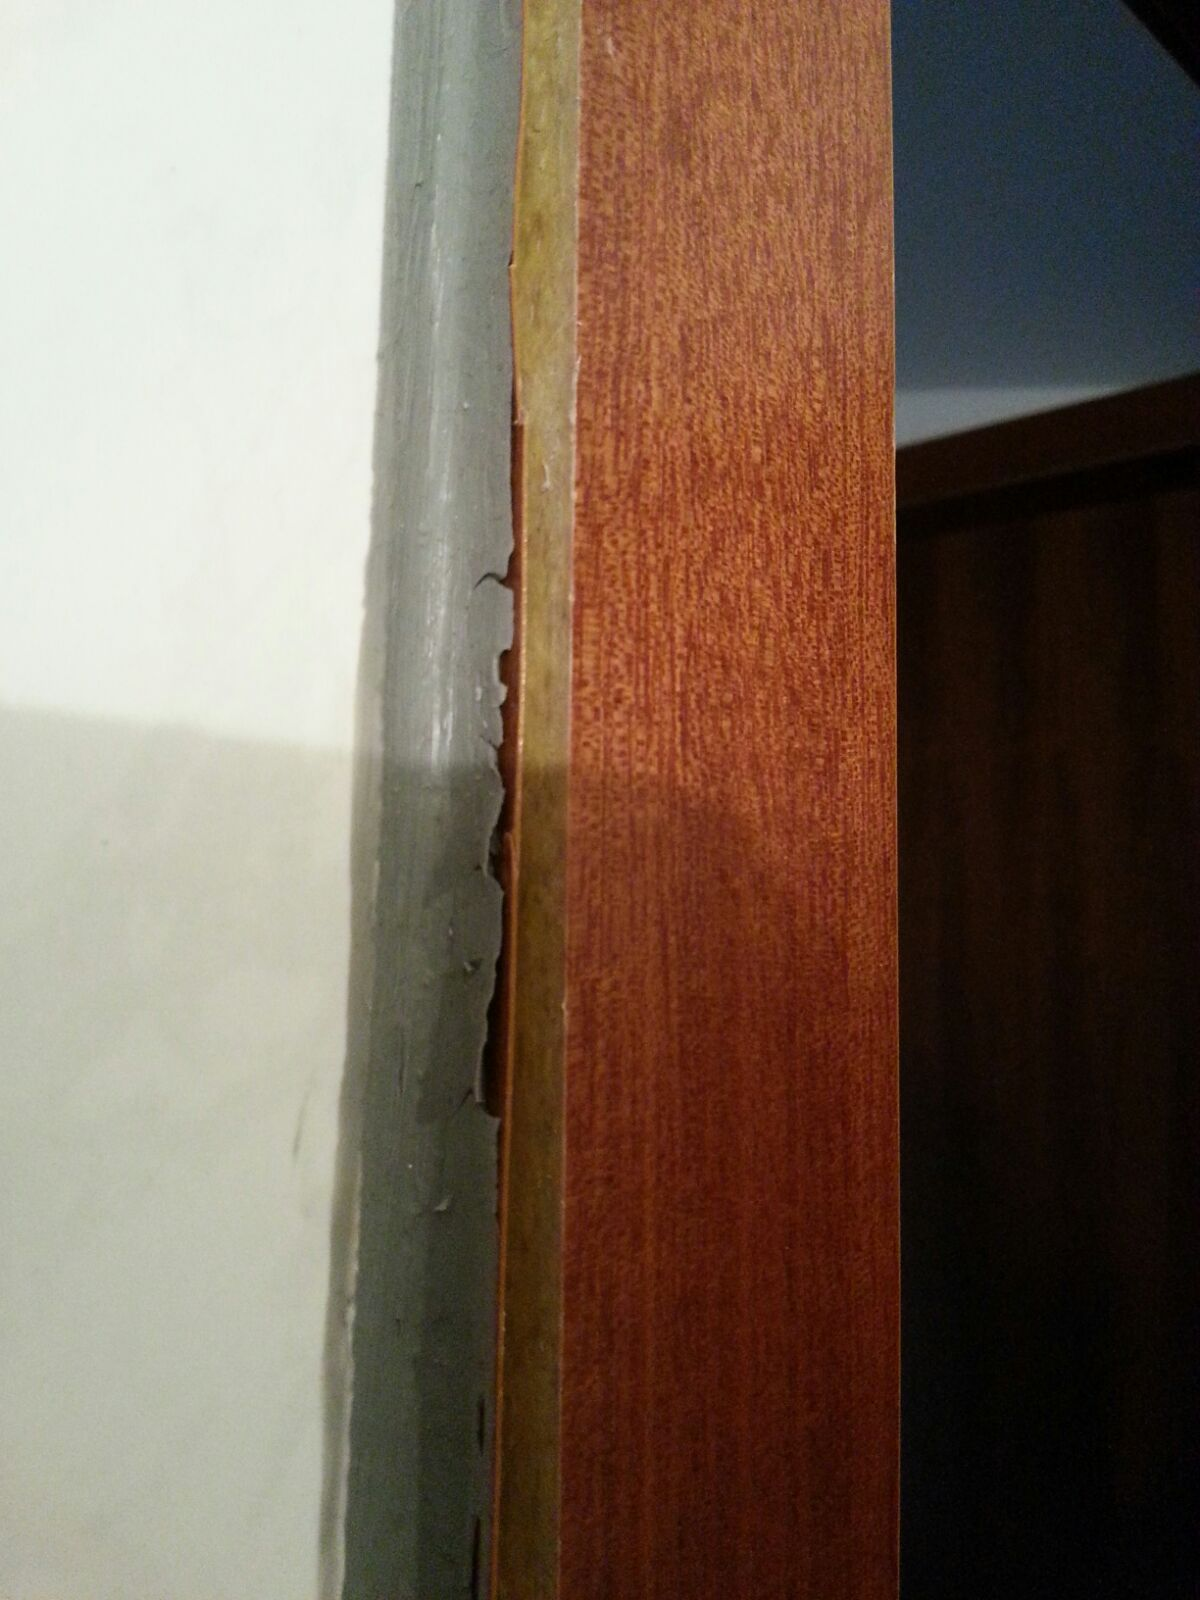 sch den in mietwohnung muss der vermieter das reparieren mietrecht miete mieter. Black Bedroom Furniture Sets. Home Design Ideas